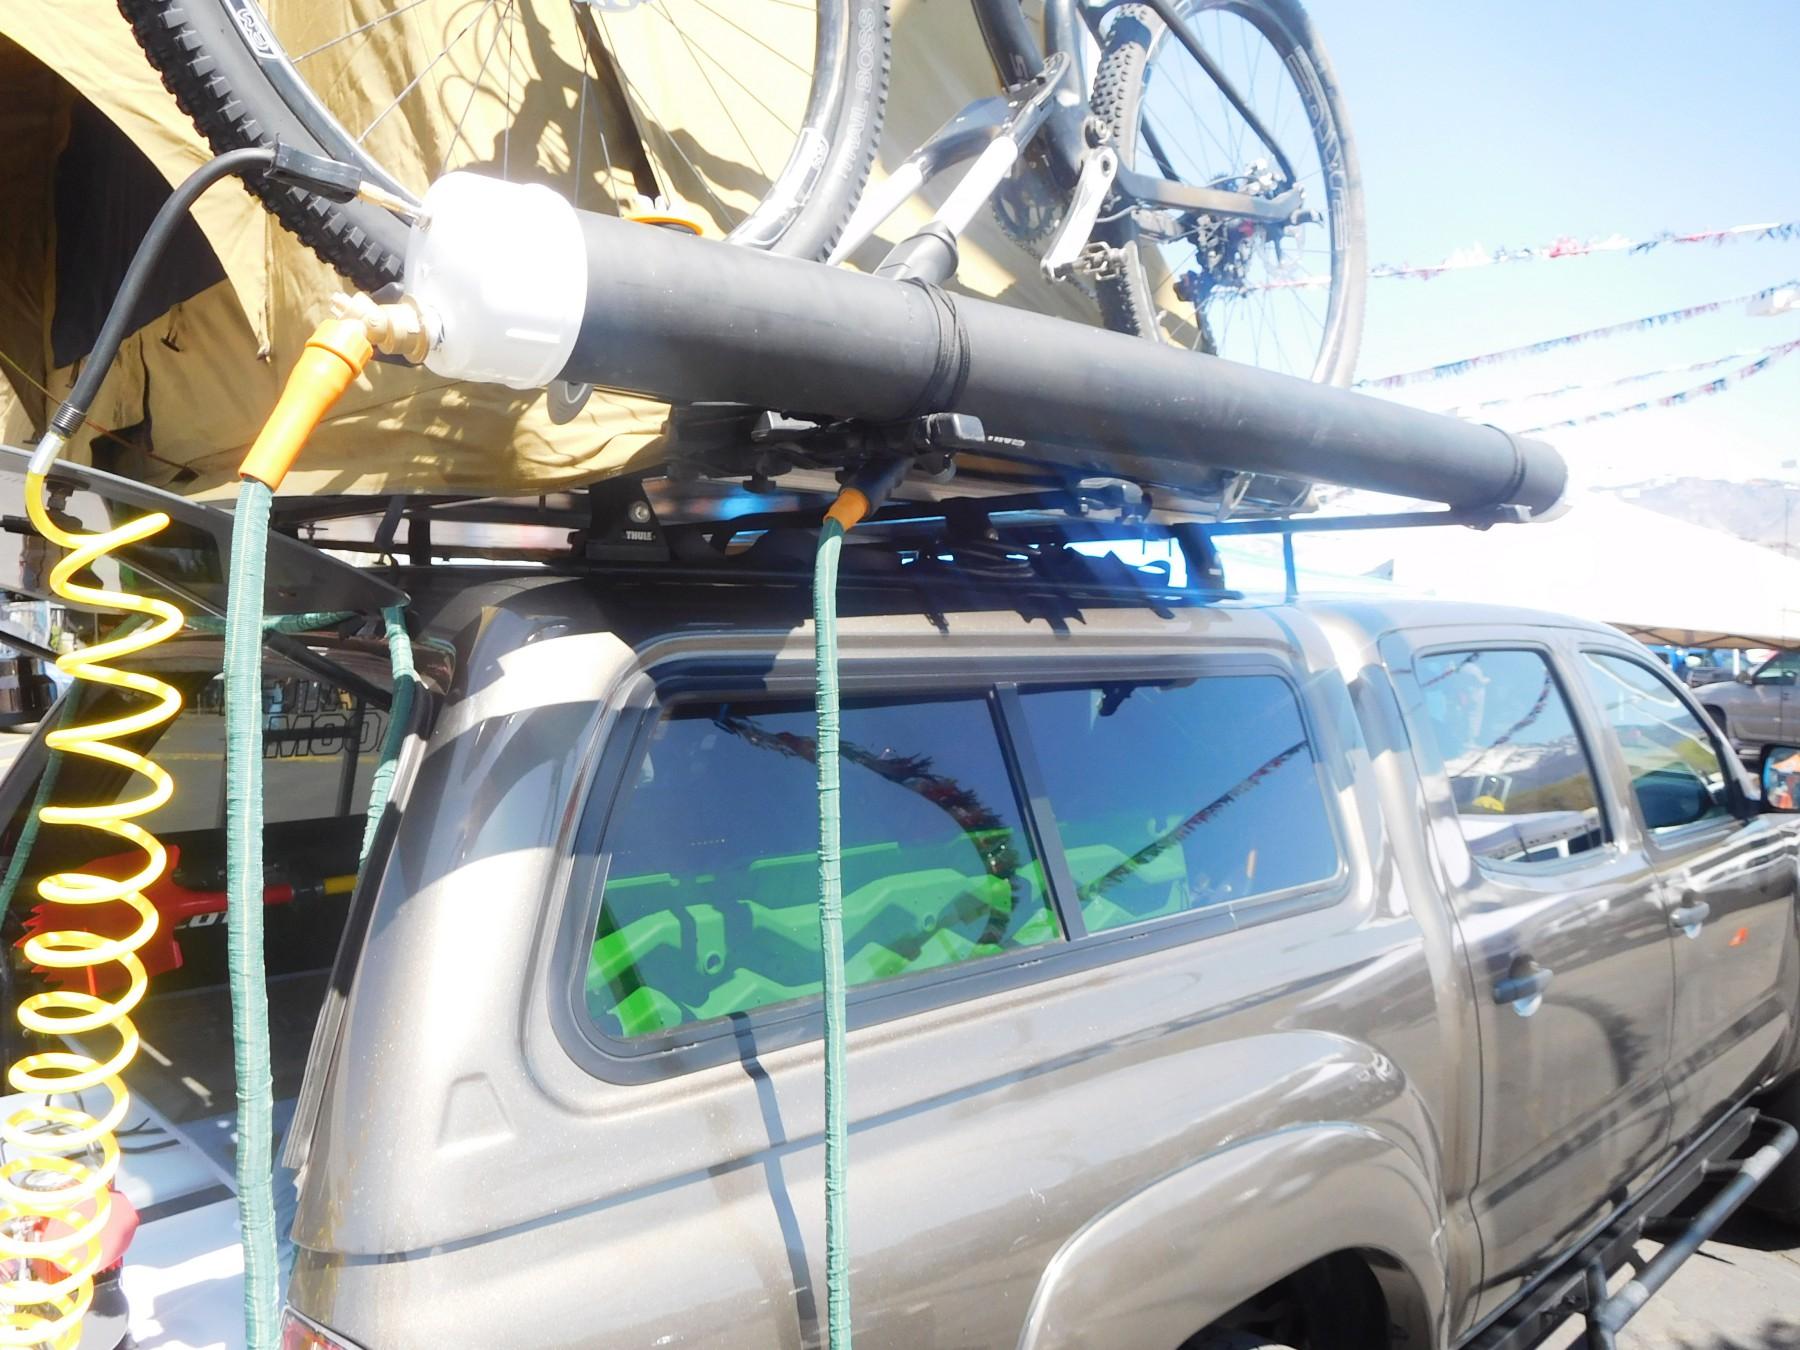 diy pvc rooftop solar shower for a car